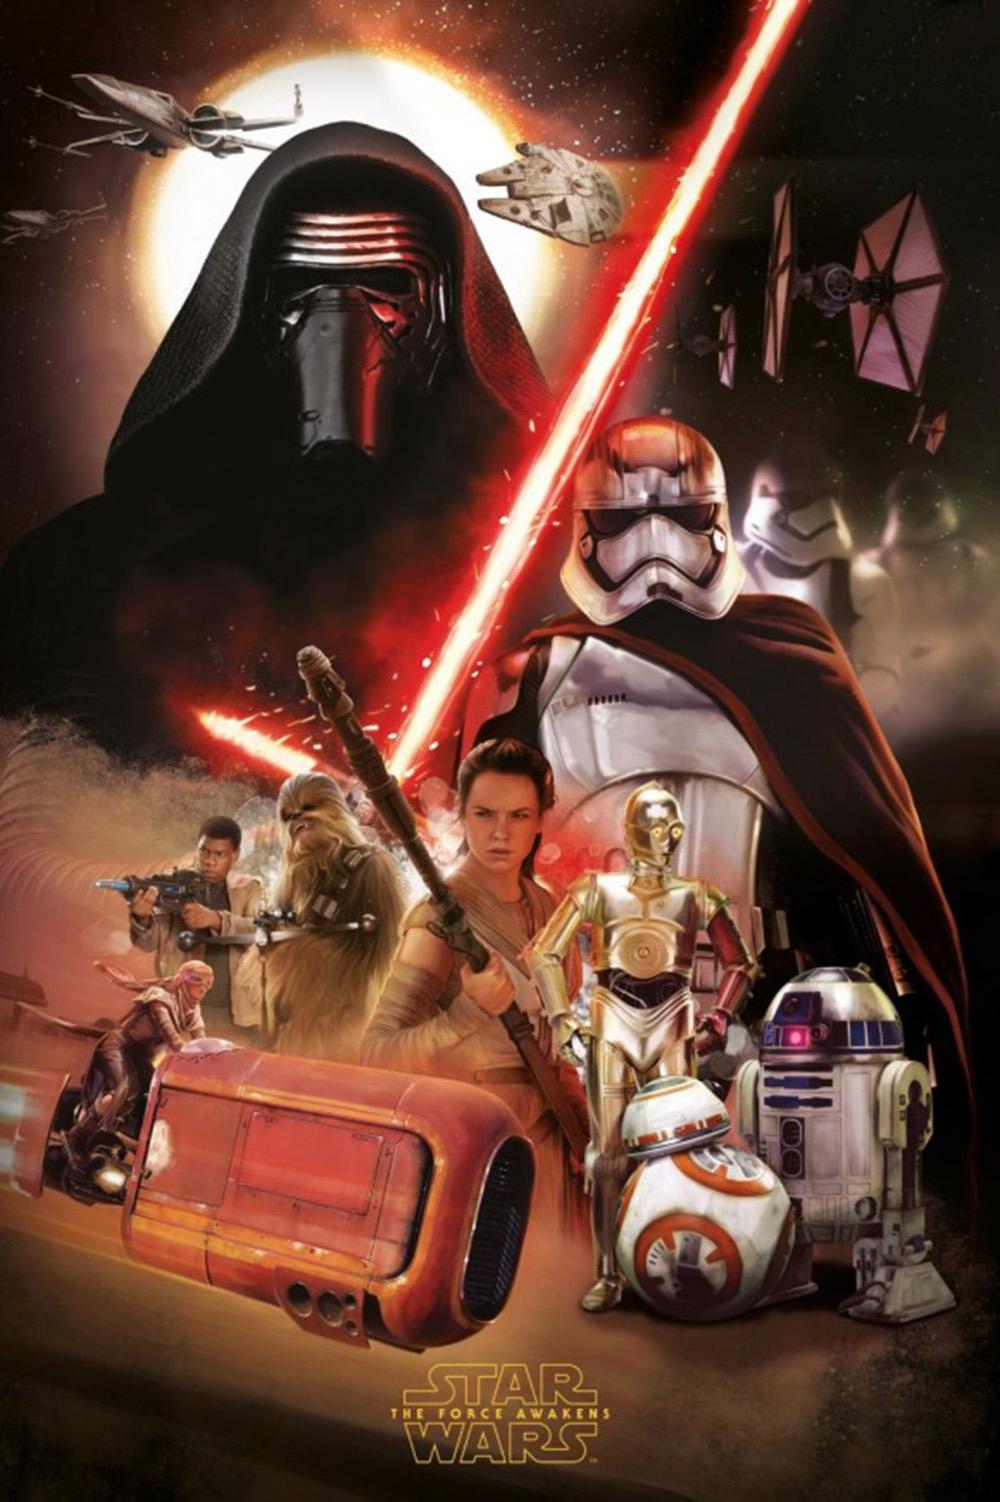 Star Wars The Force Awakens Promo Art Plus Opening